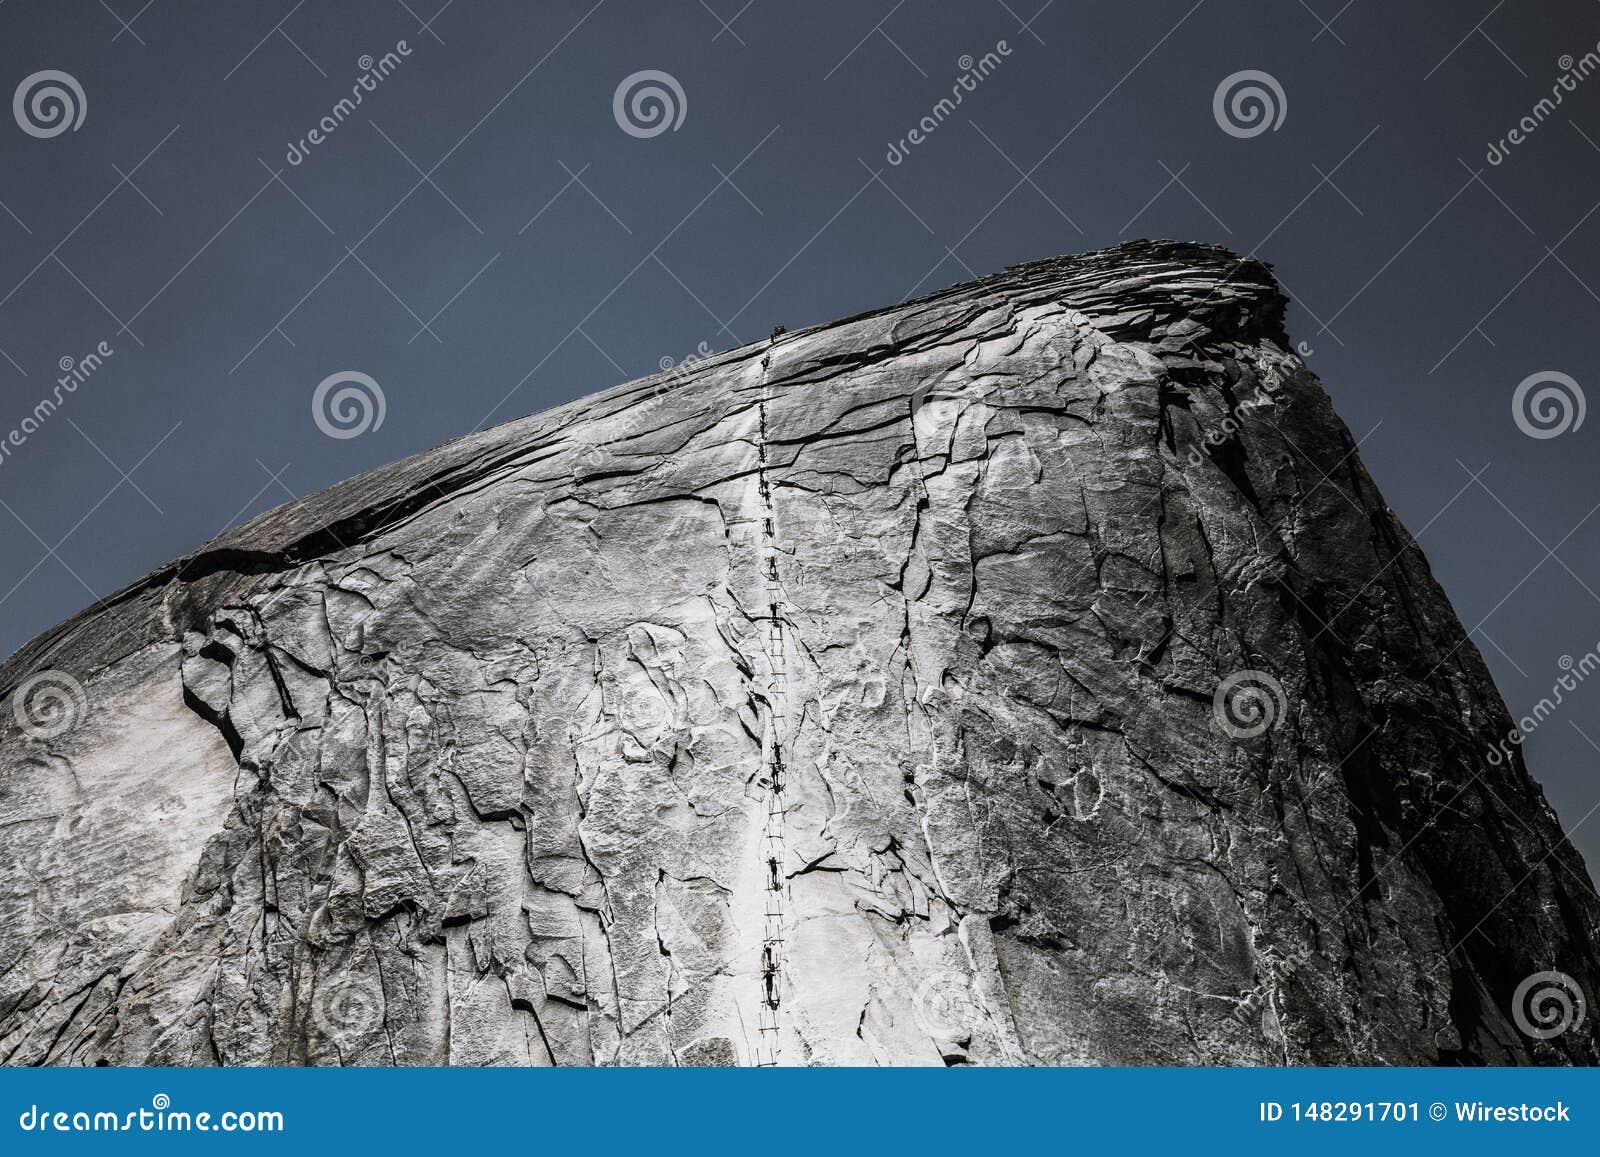 Tiro hermoso de la roca con textura fresca